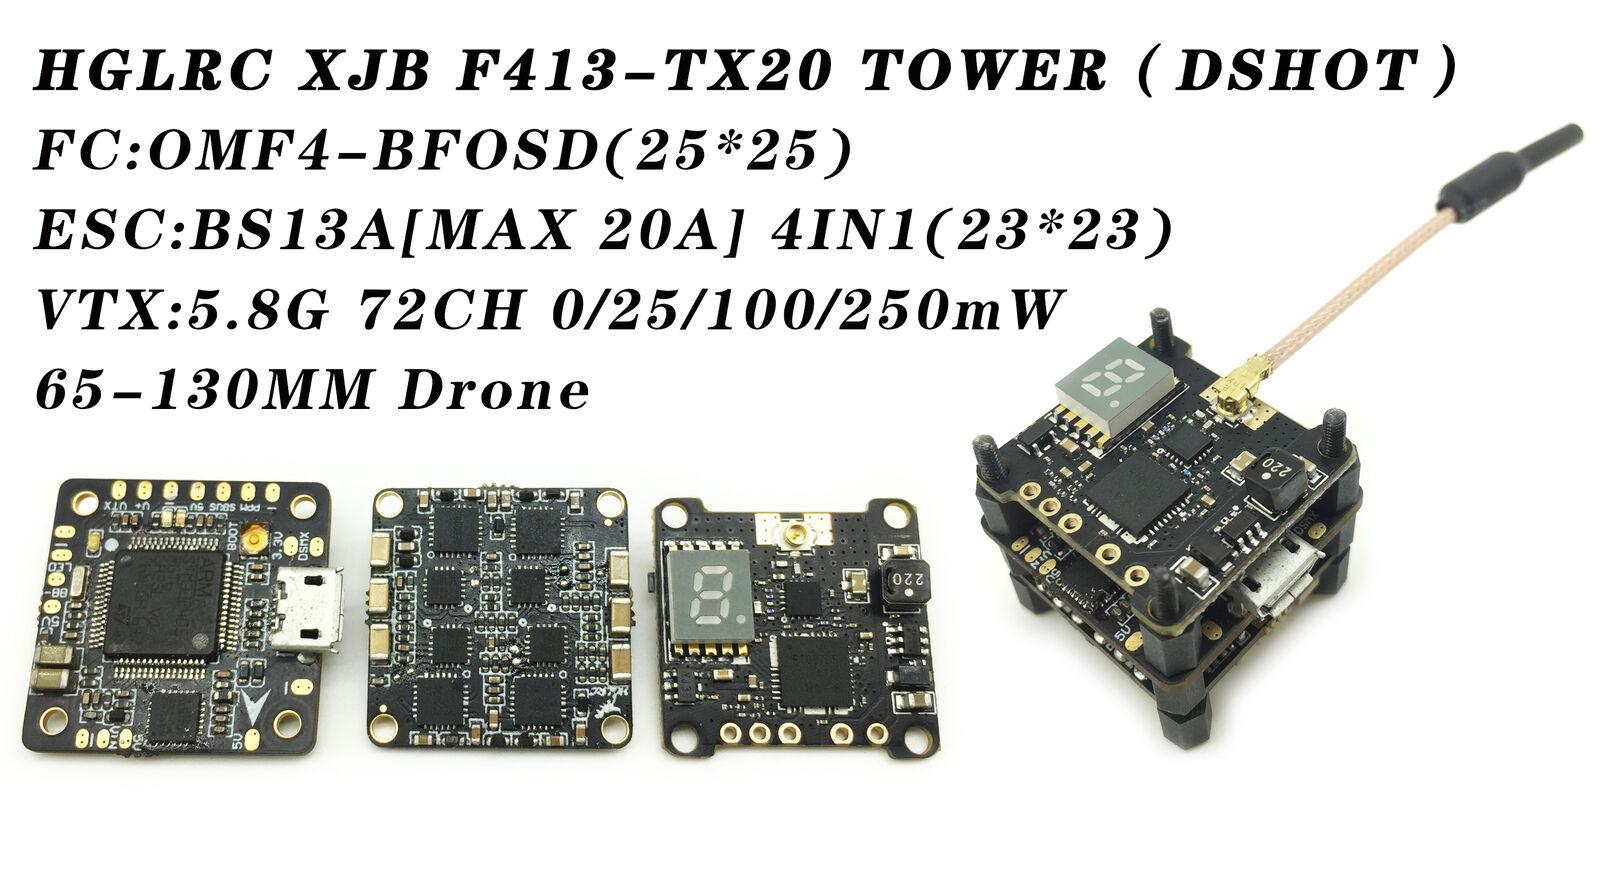 HGLRC XJB F413-TX20-ELF Flight TOWER CAMERA DSHOT Flight Control Board BS13A VTX